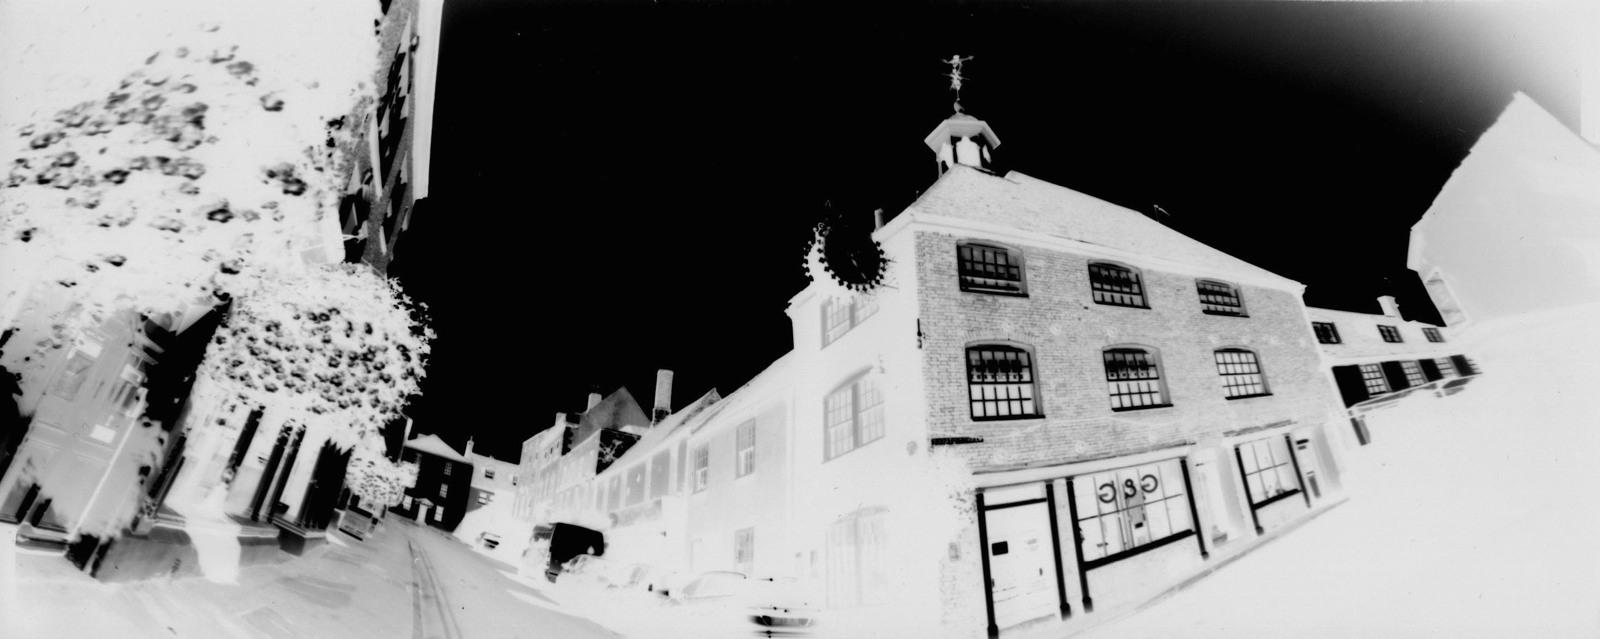 1. Clock tower